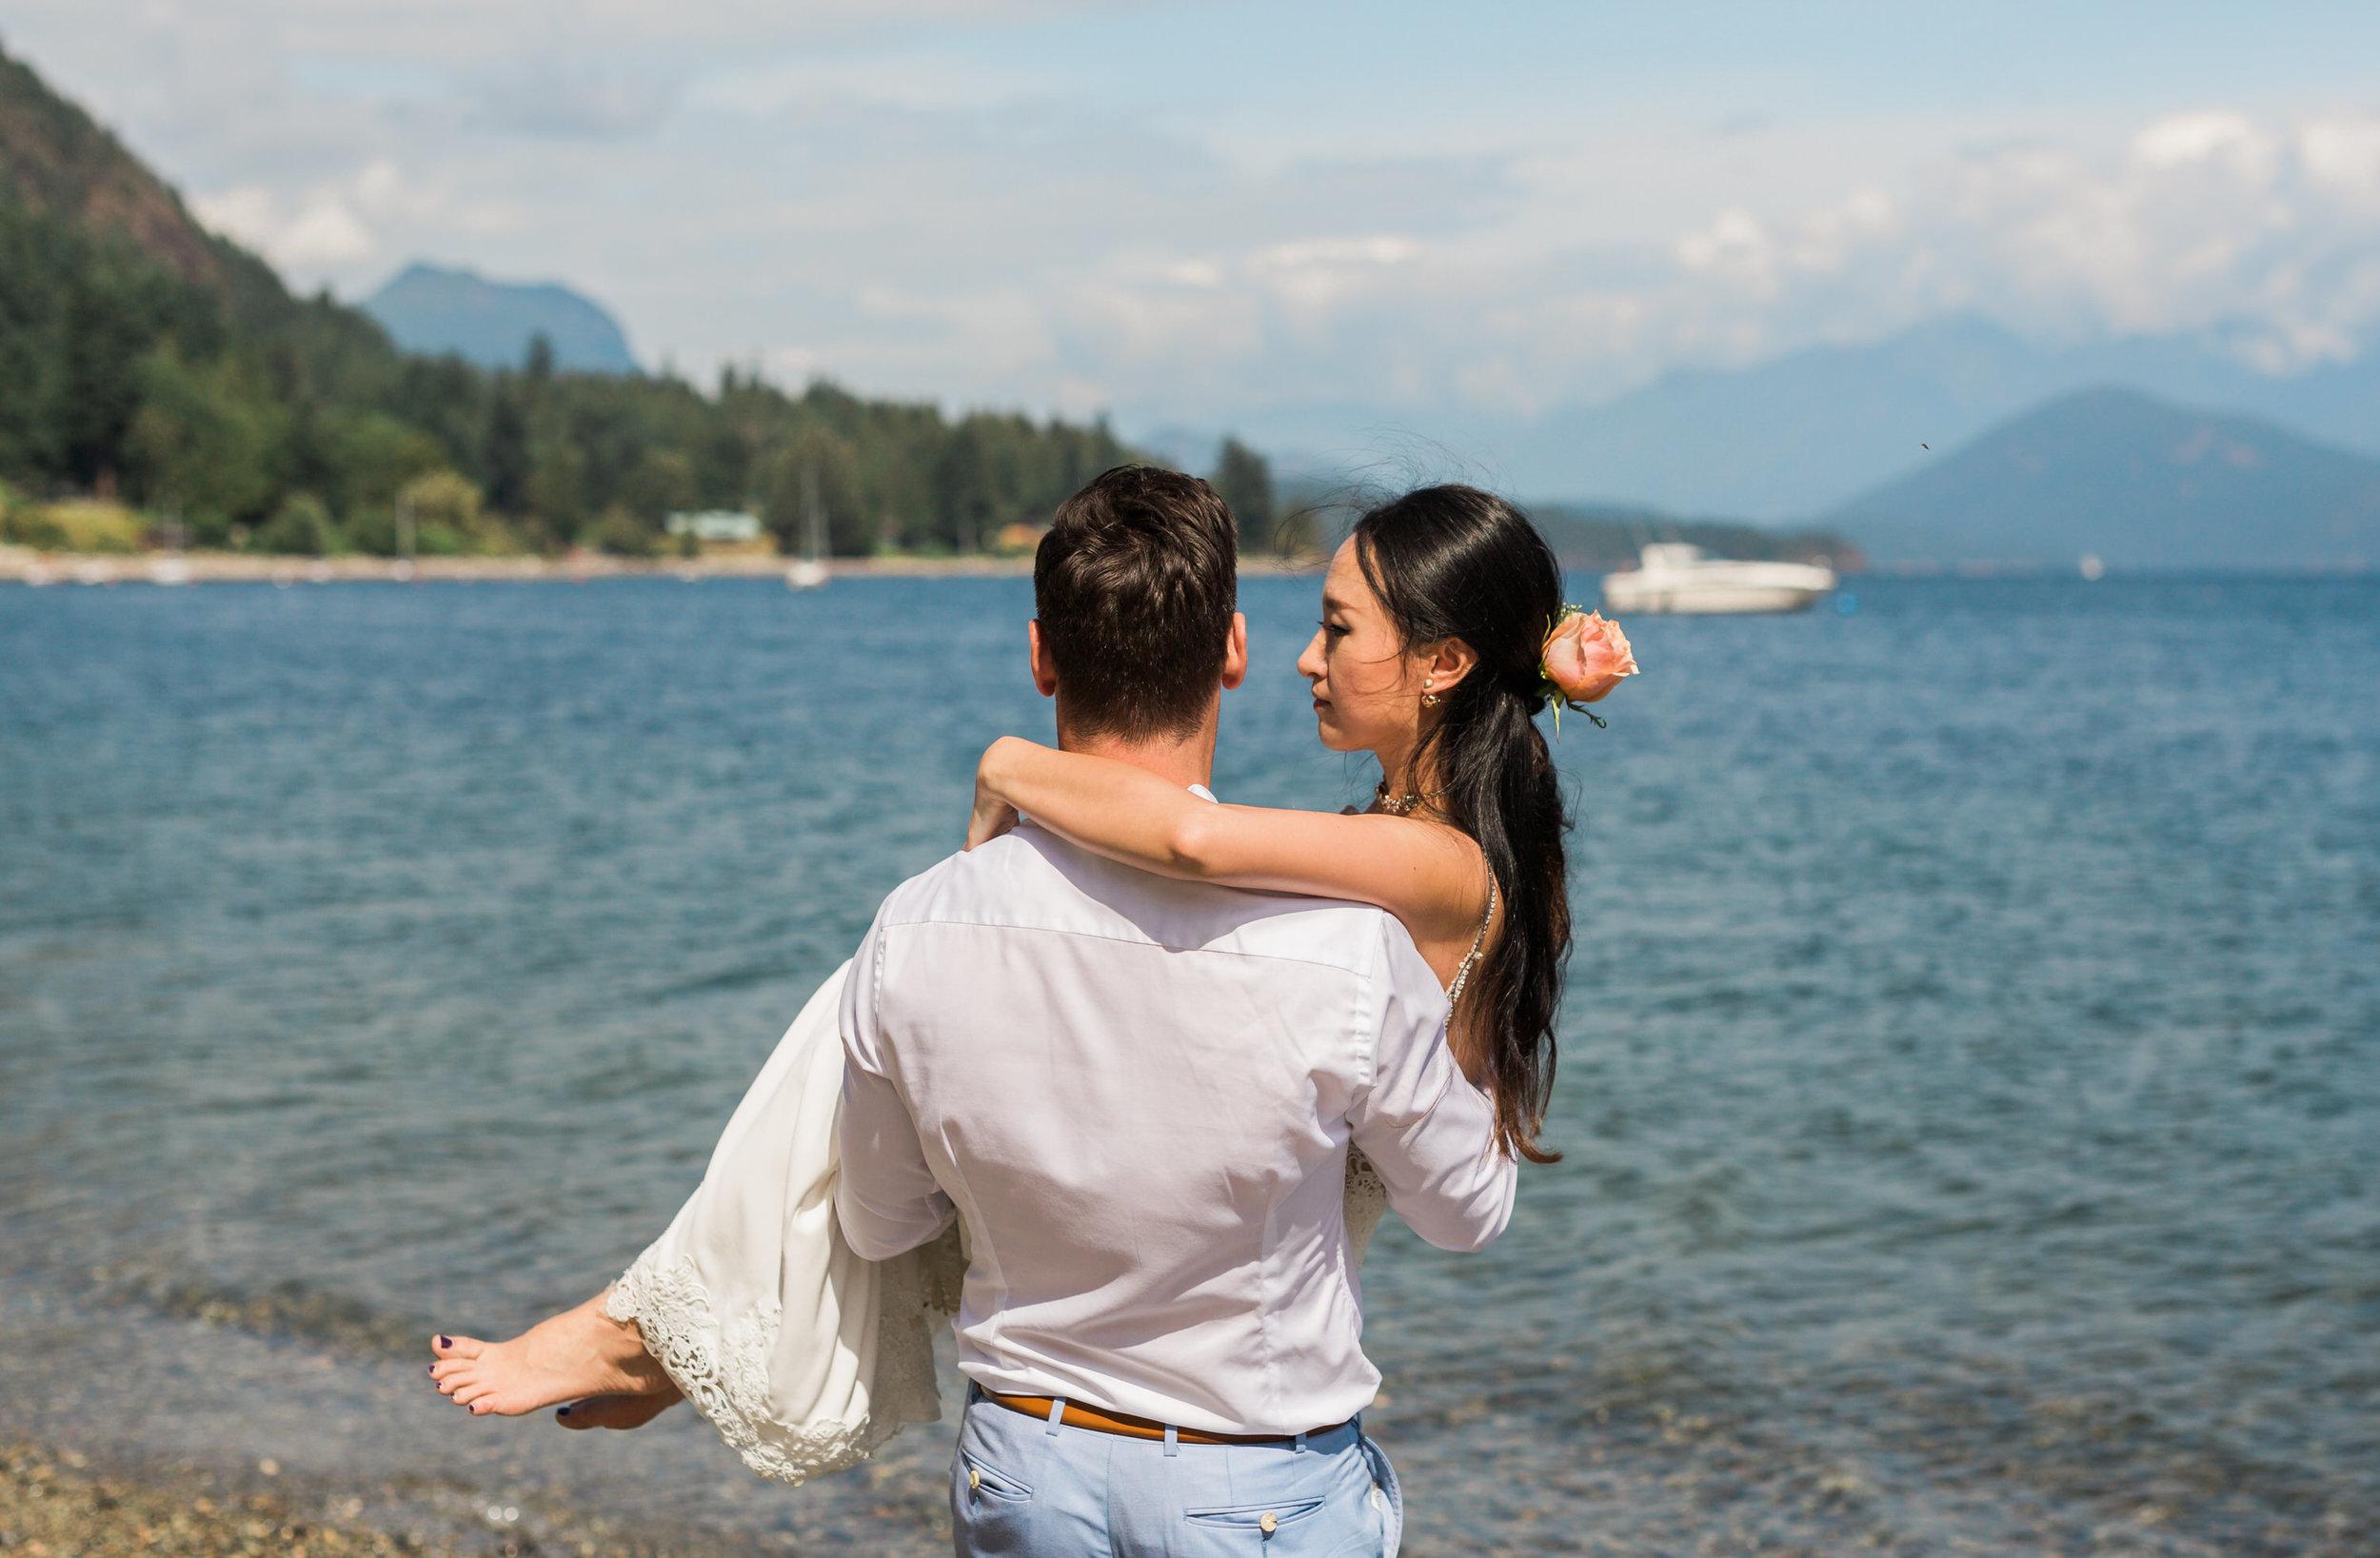 Gibsons Wedding Photos - Sunshine Coast Wedding Photos - Vancouver Wedding Photographer & Videographer - Sunshine Coast Wedding Photos - Sunshine Coast Wedding Photographer - Jennifer Picard Photography - IMG_0098.jpg